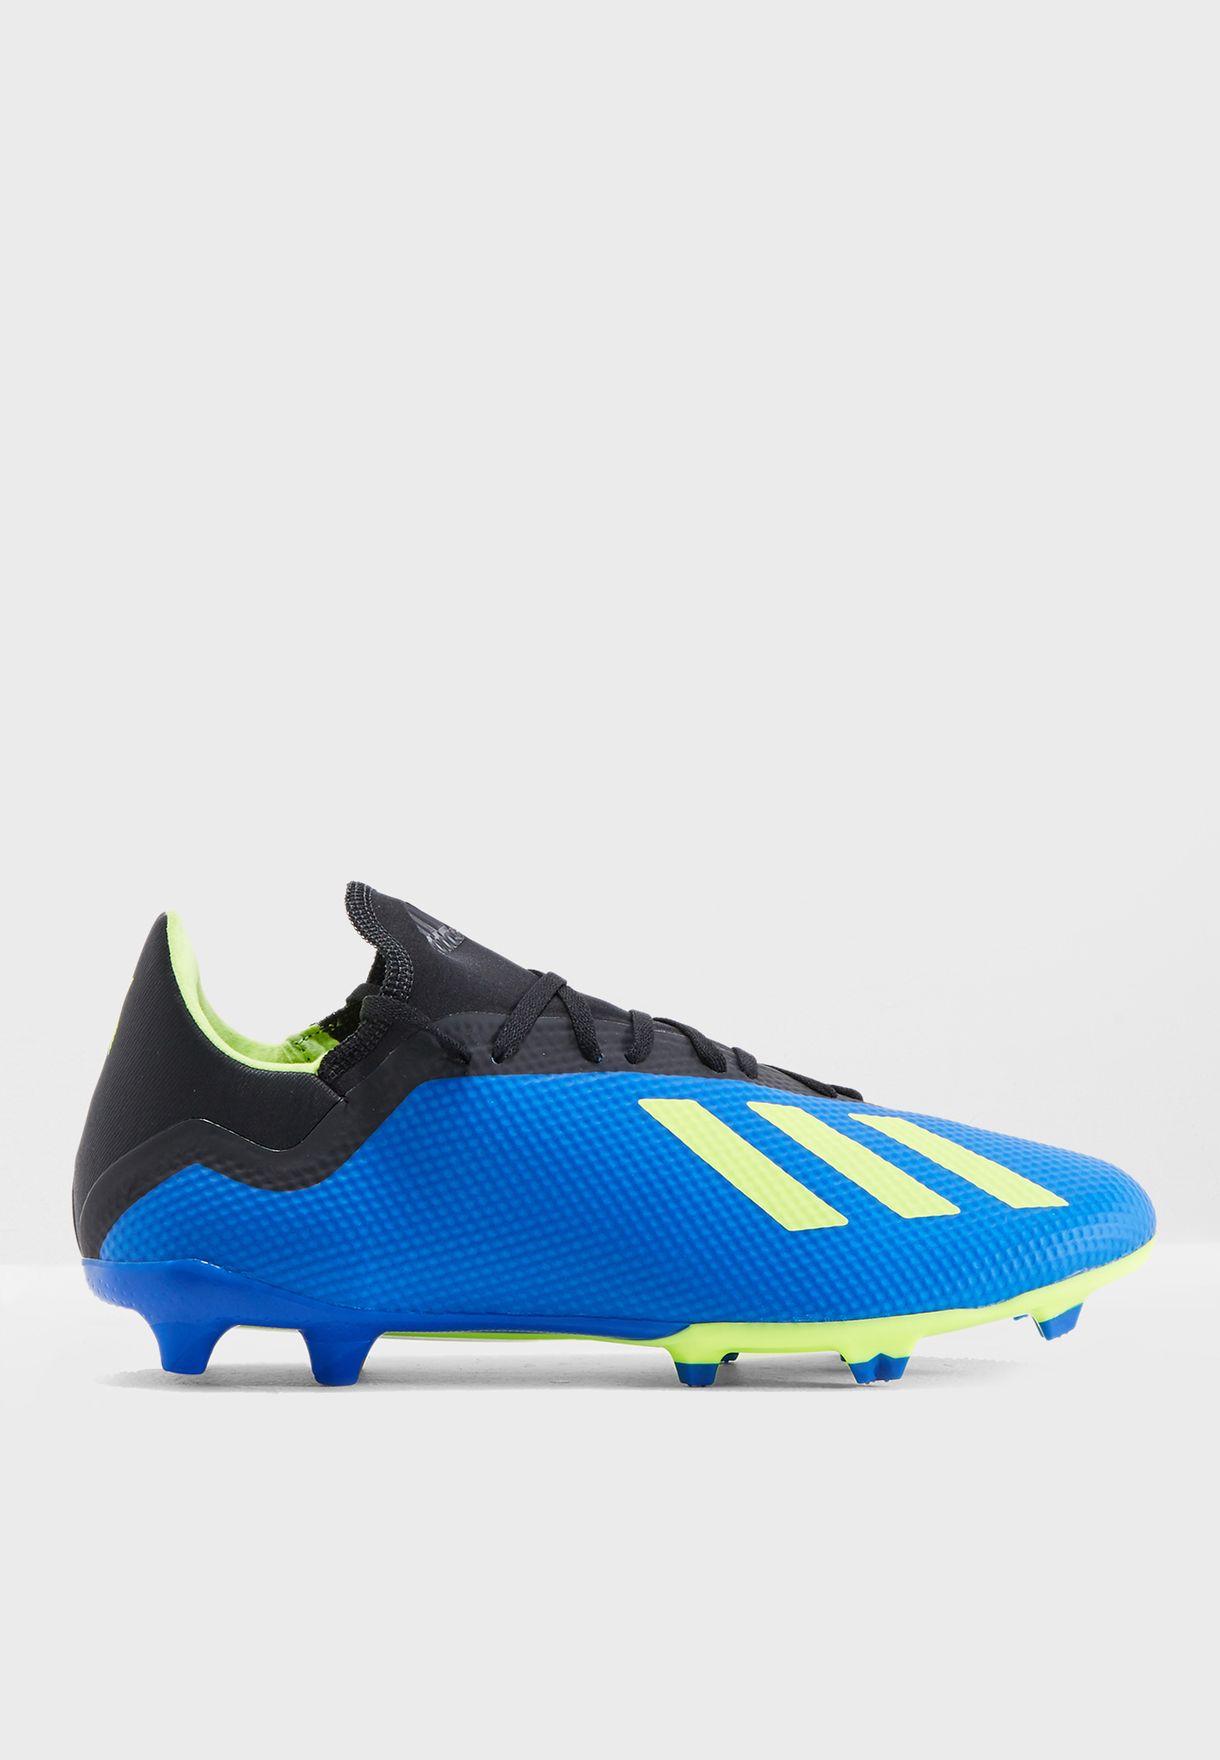 b0f60f88337a7 تسوق حذاء اكس 18.3 اف جي ماركة اديداس لون أزرق DA9335 في السعودية ...